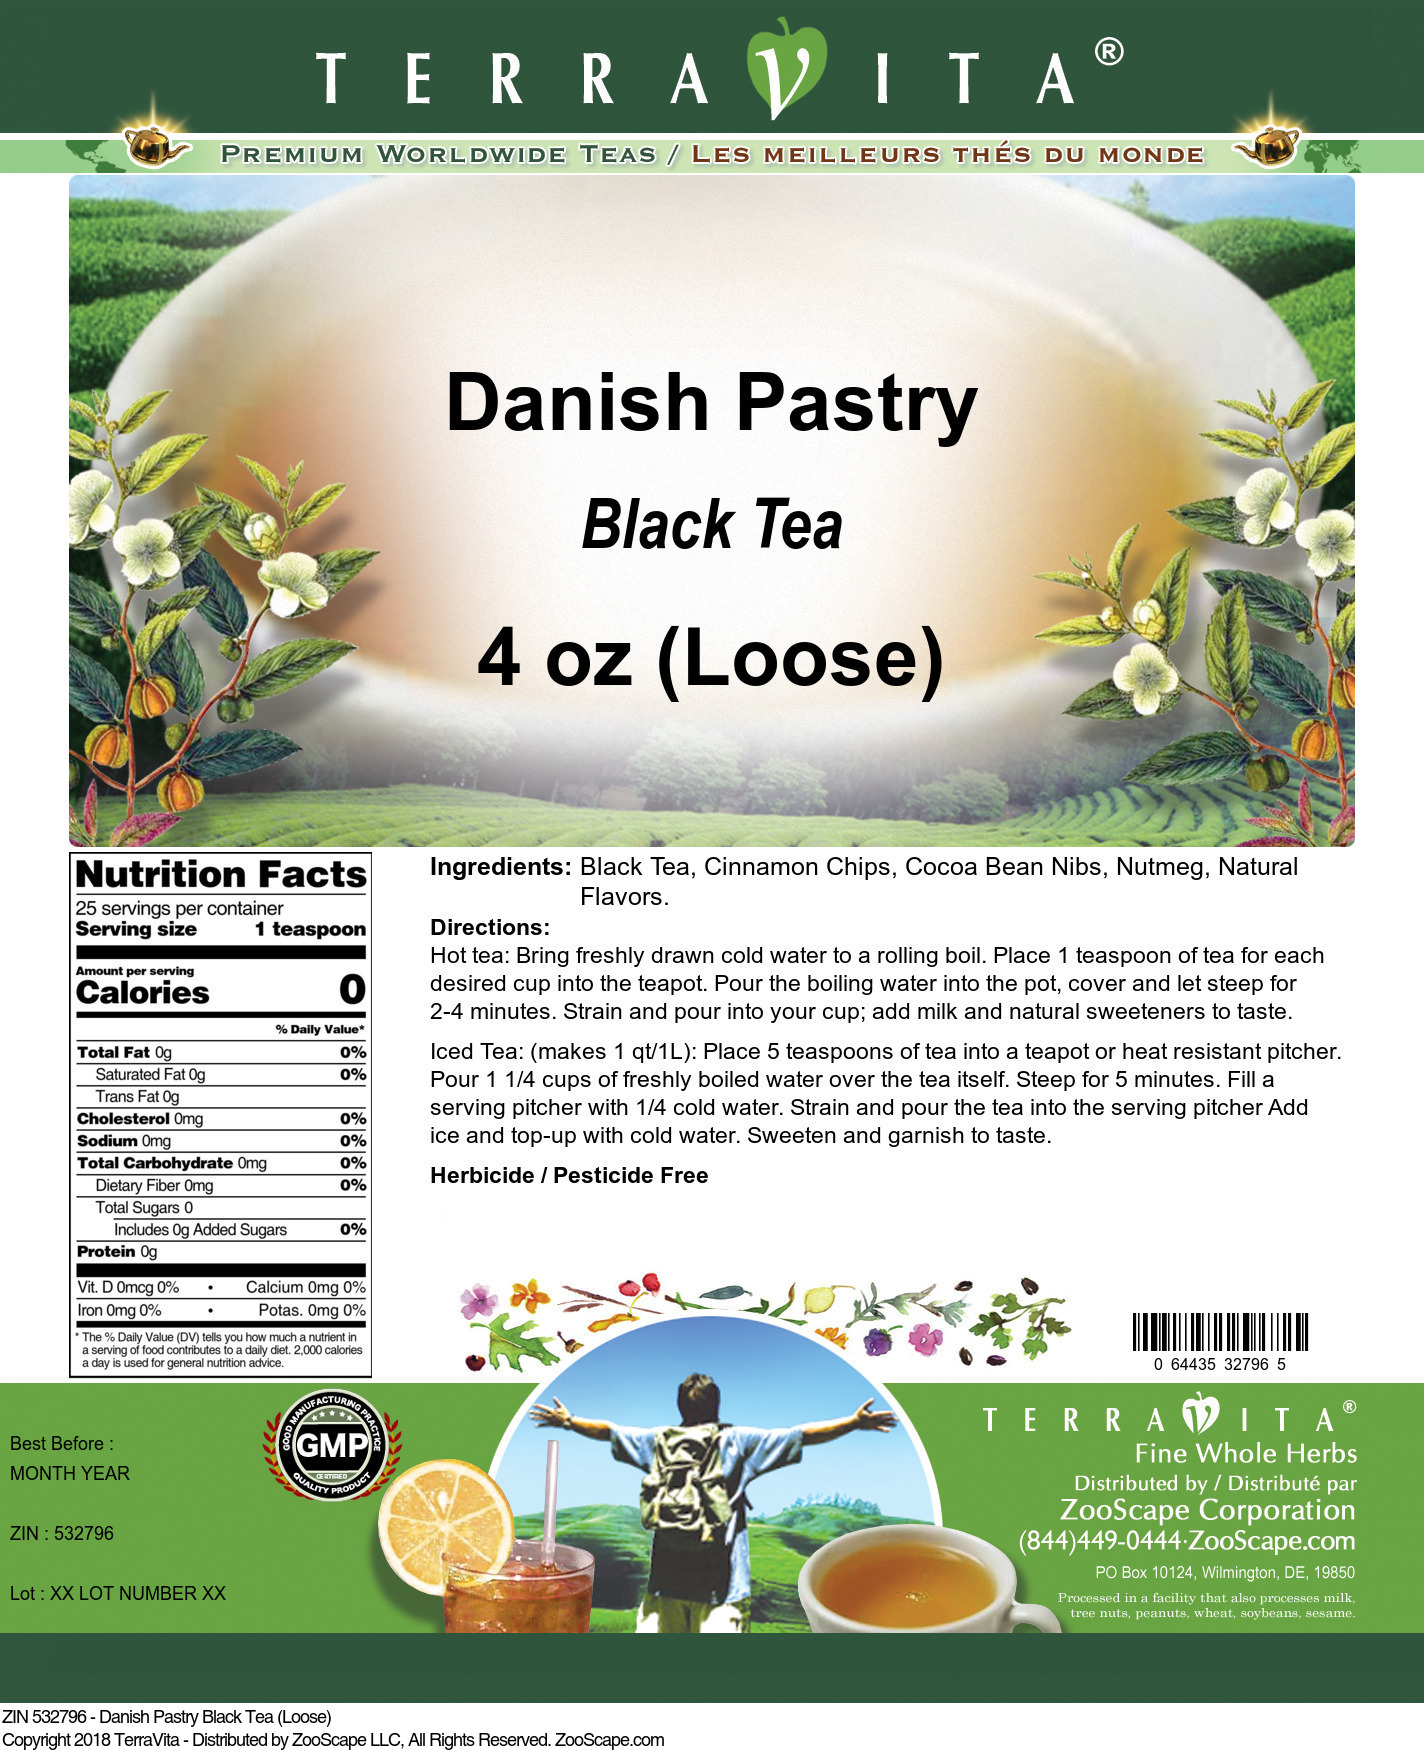 Danish Pastry Black Tea